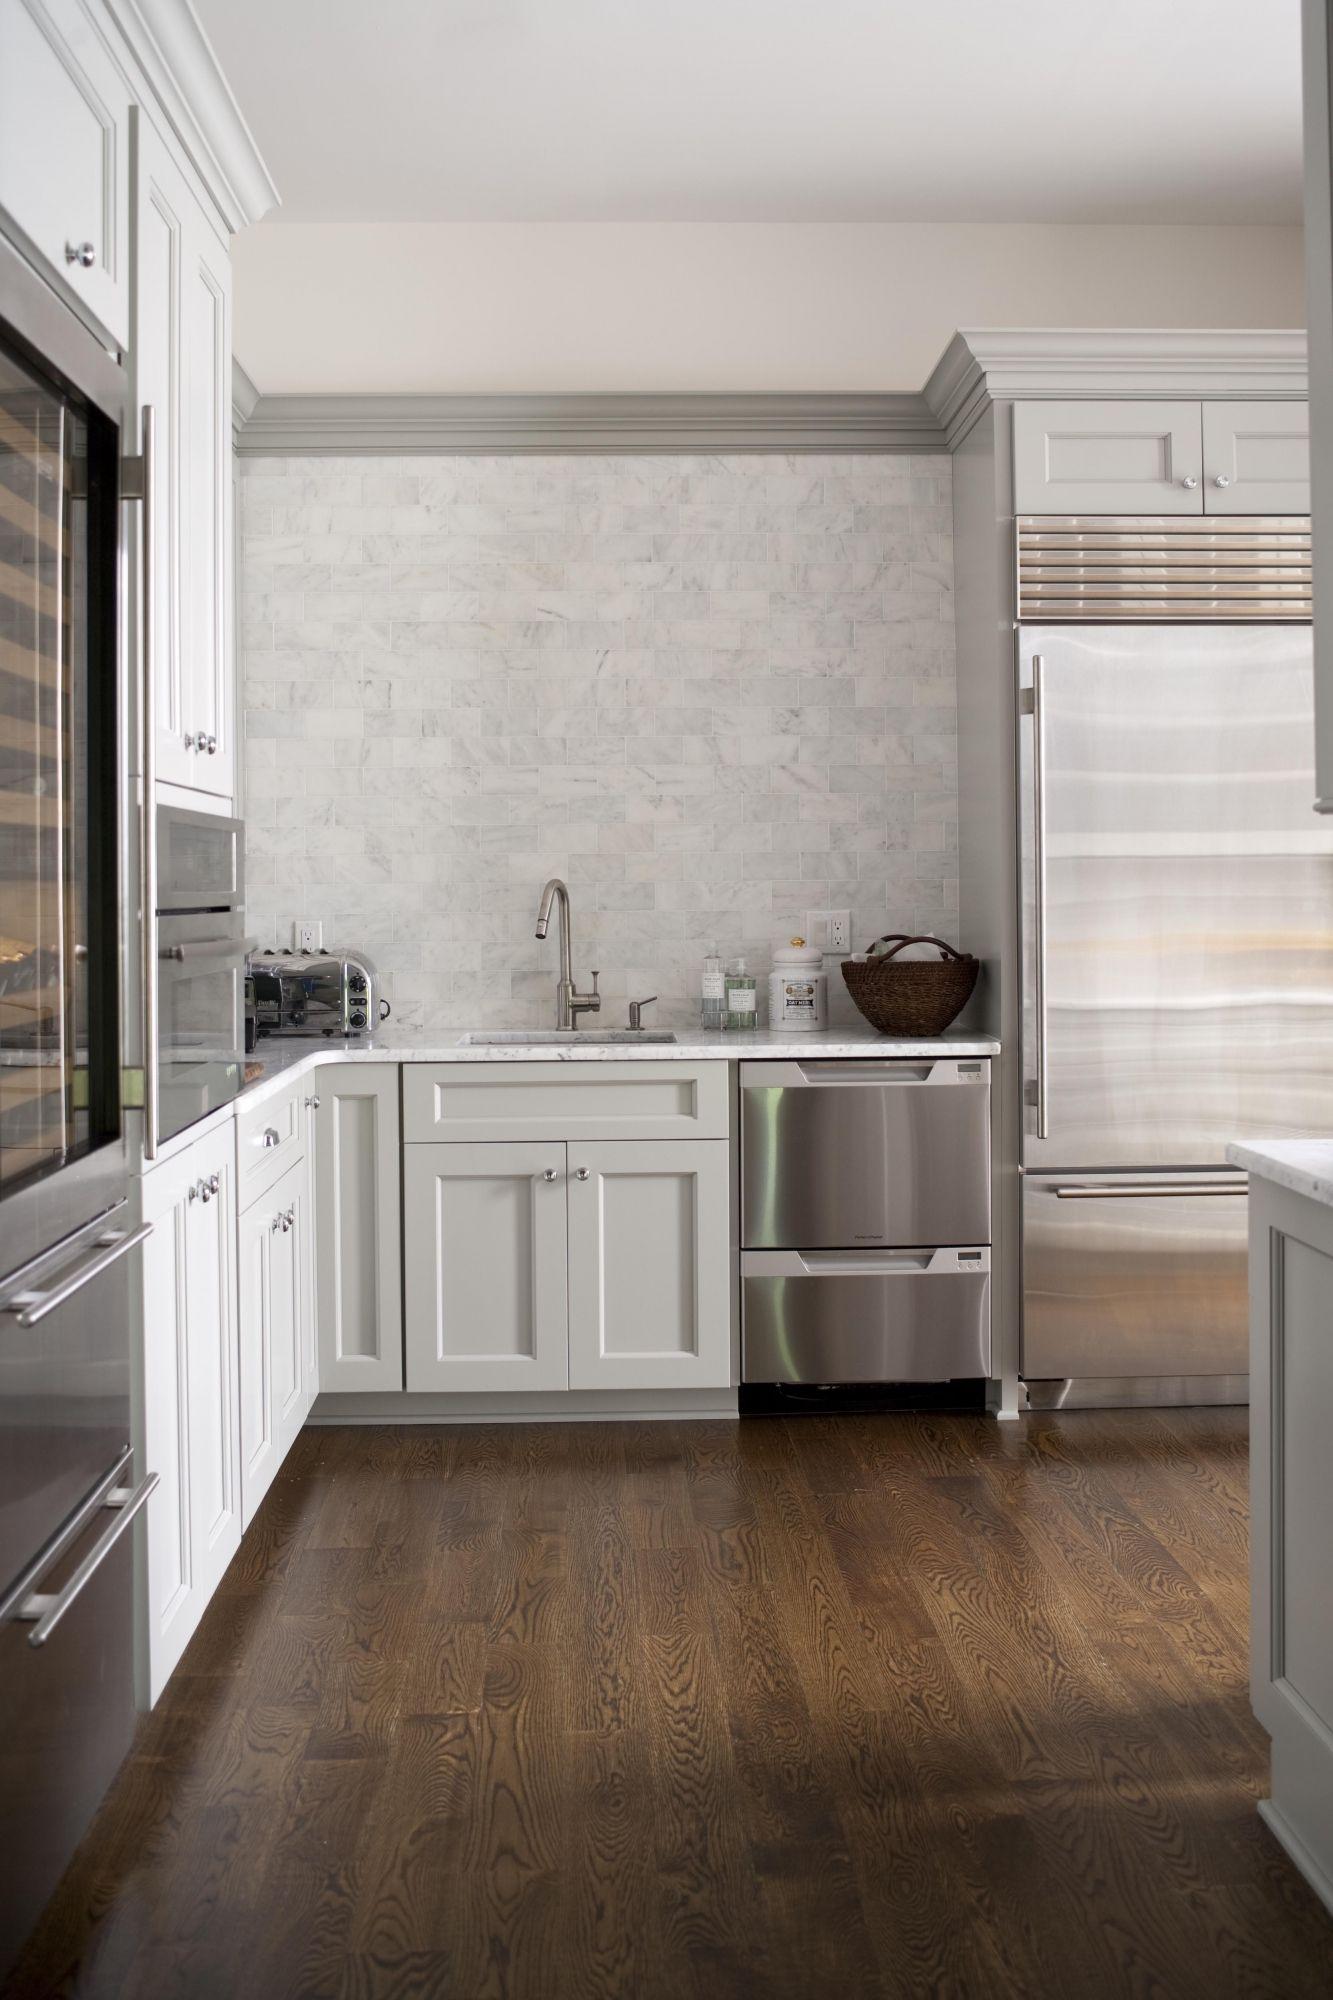 Carrara marble as the countertops and subway tile backsplash from